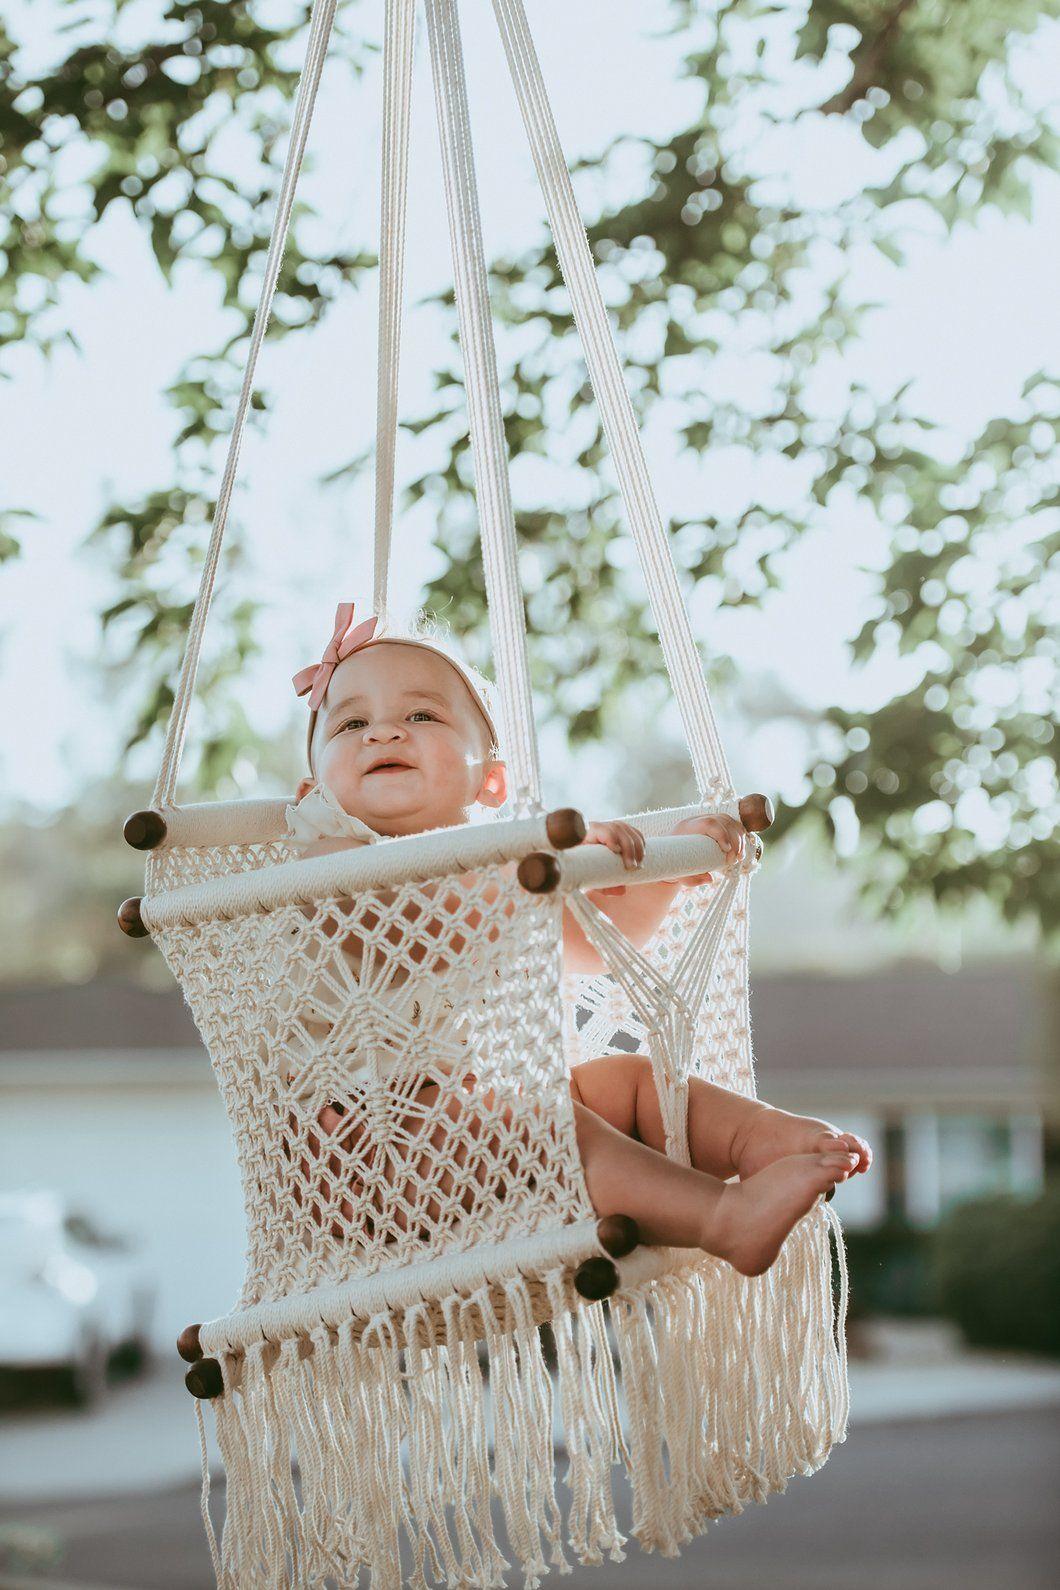 Macramé Baby Swing Handmade in Nicaragua in 2020 Baby